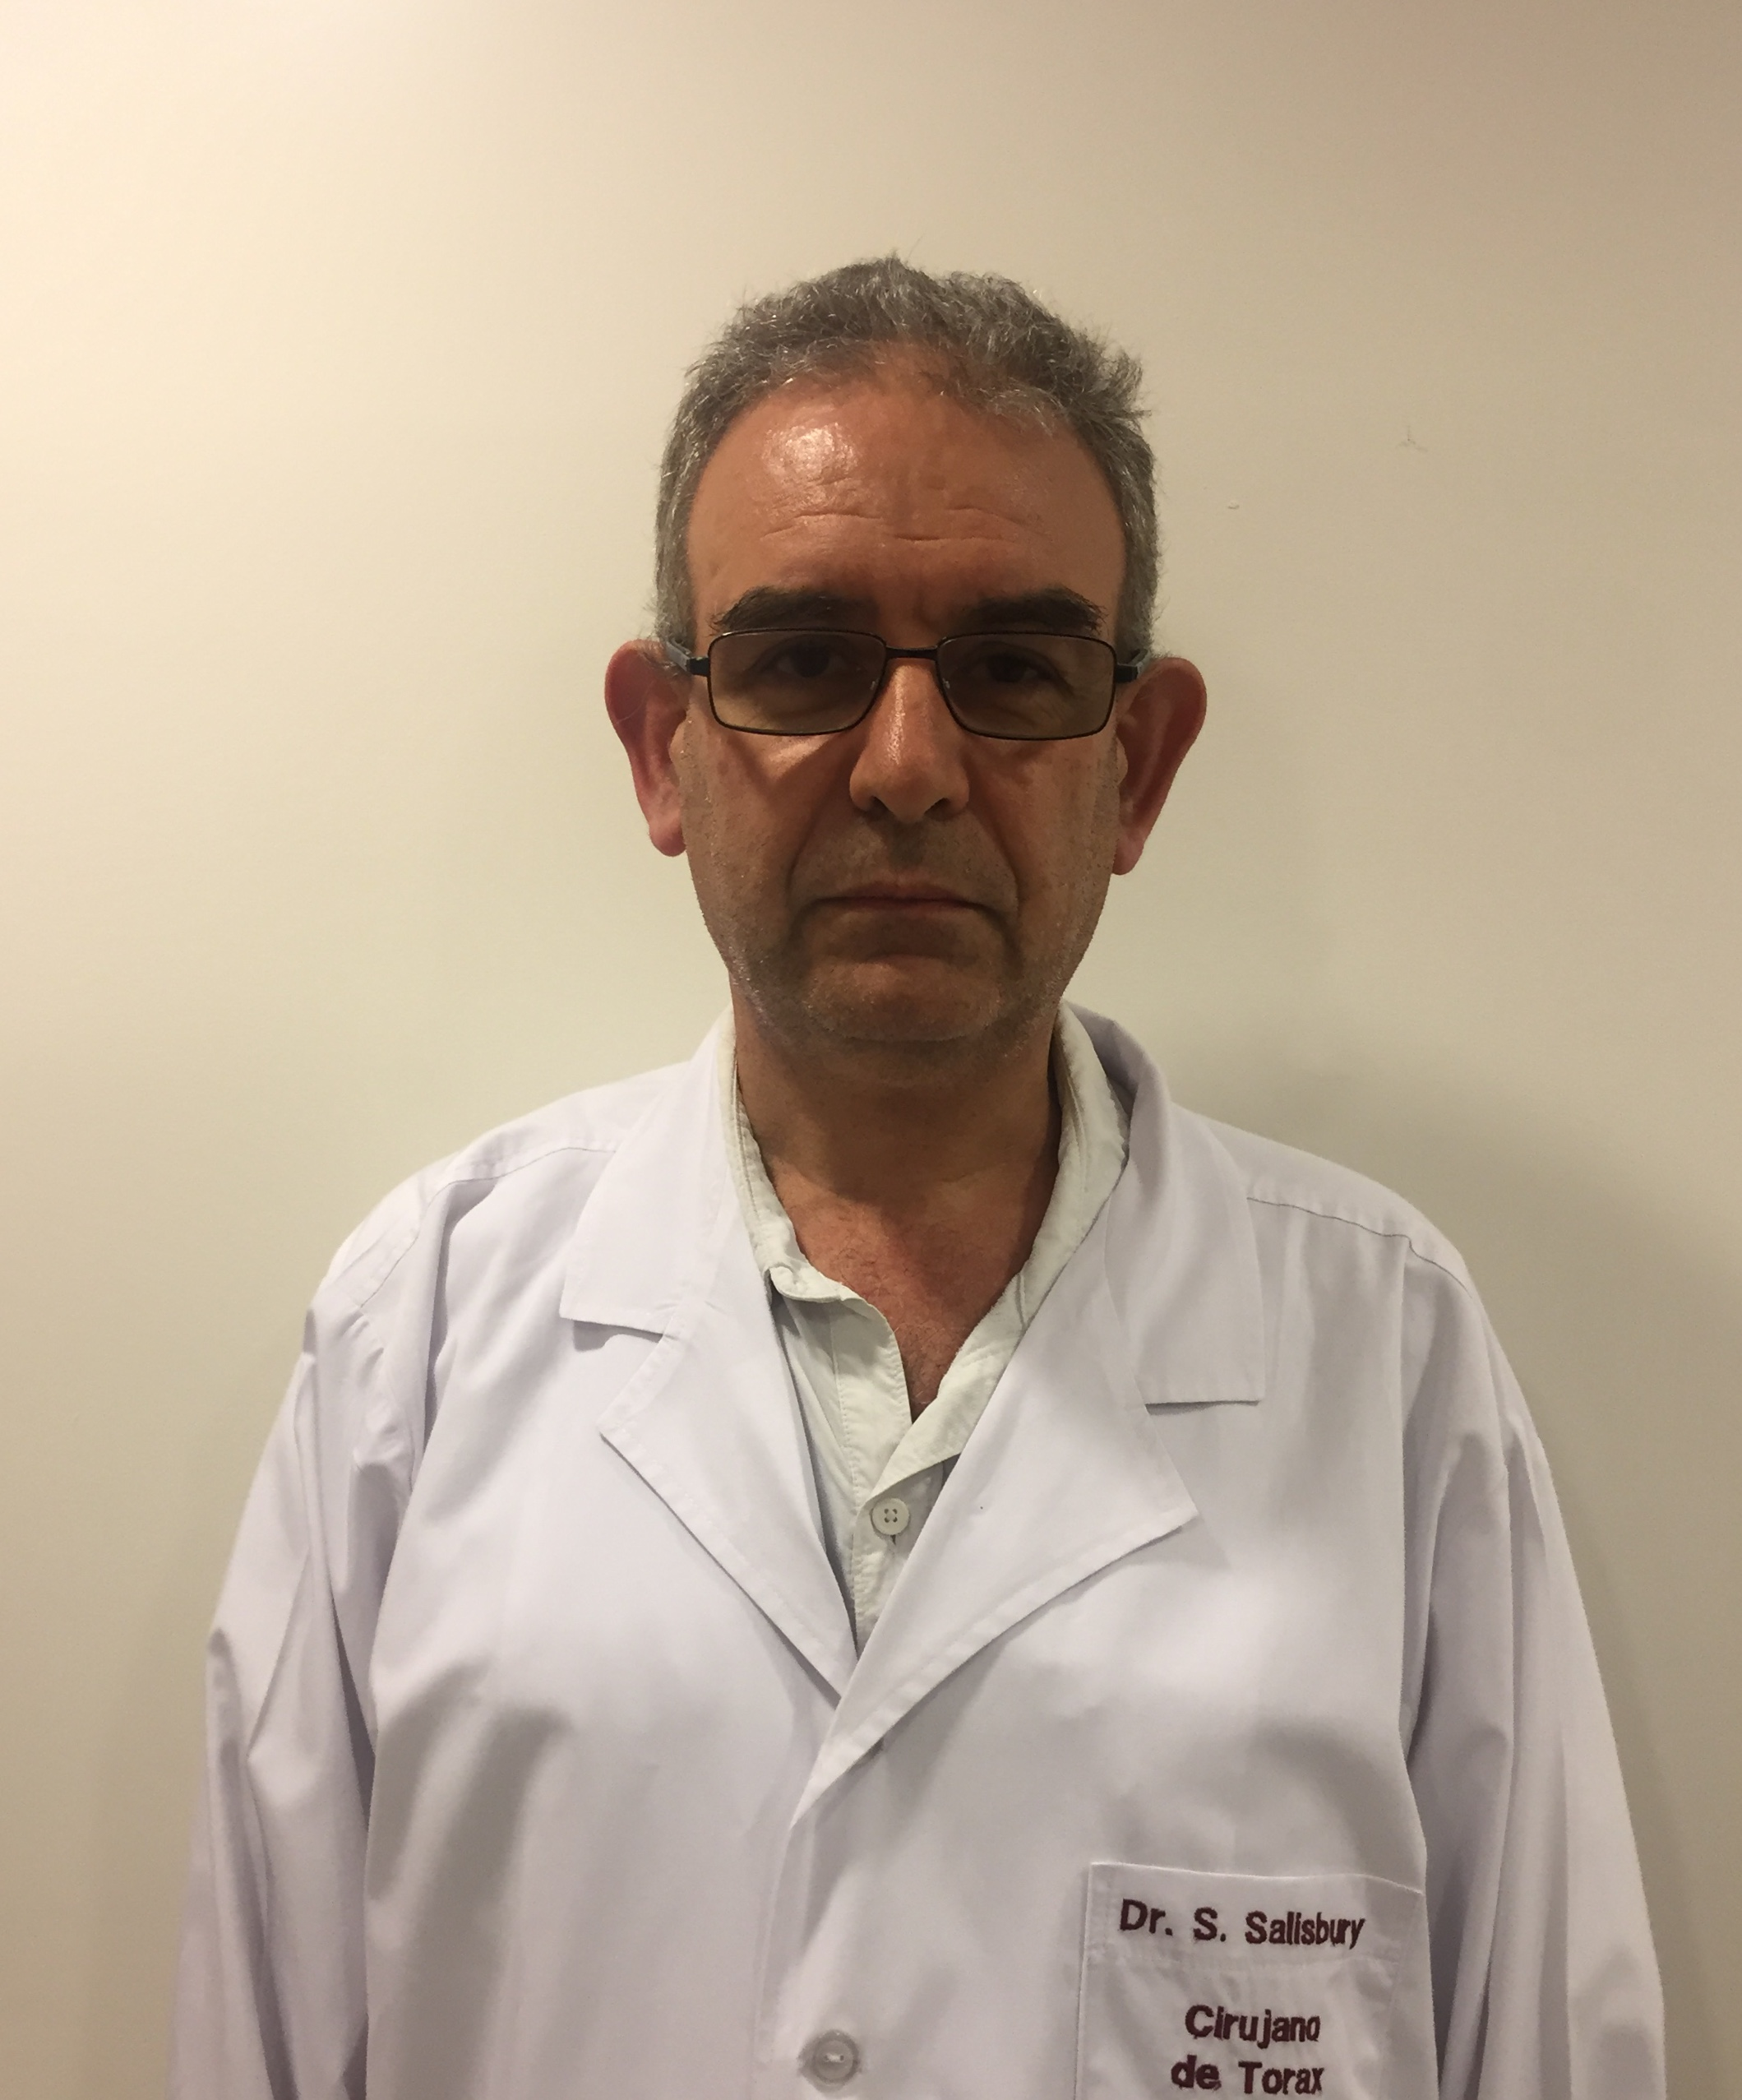 Dr. Salisbury Siul